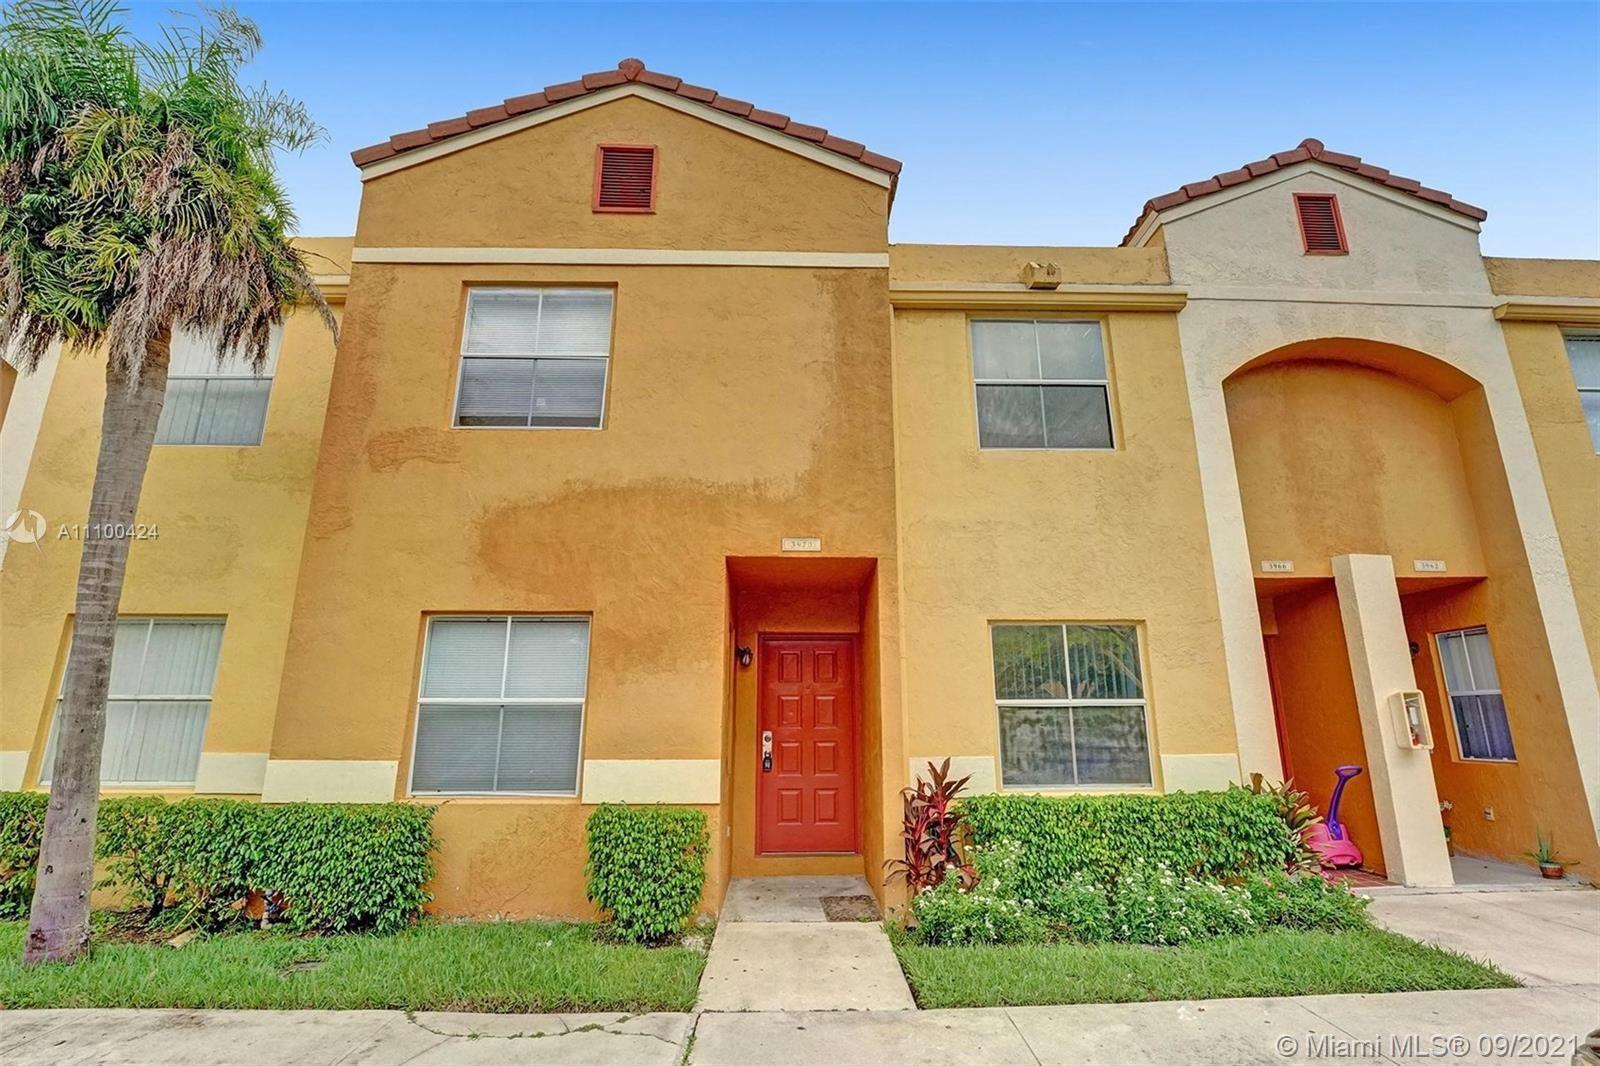 3970 NW 90th Ave #3970, Sunrise, FL 33351 - MLS#: A11100424